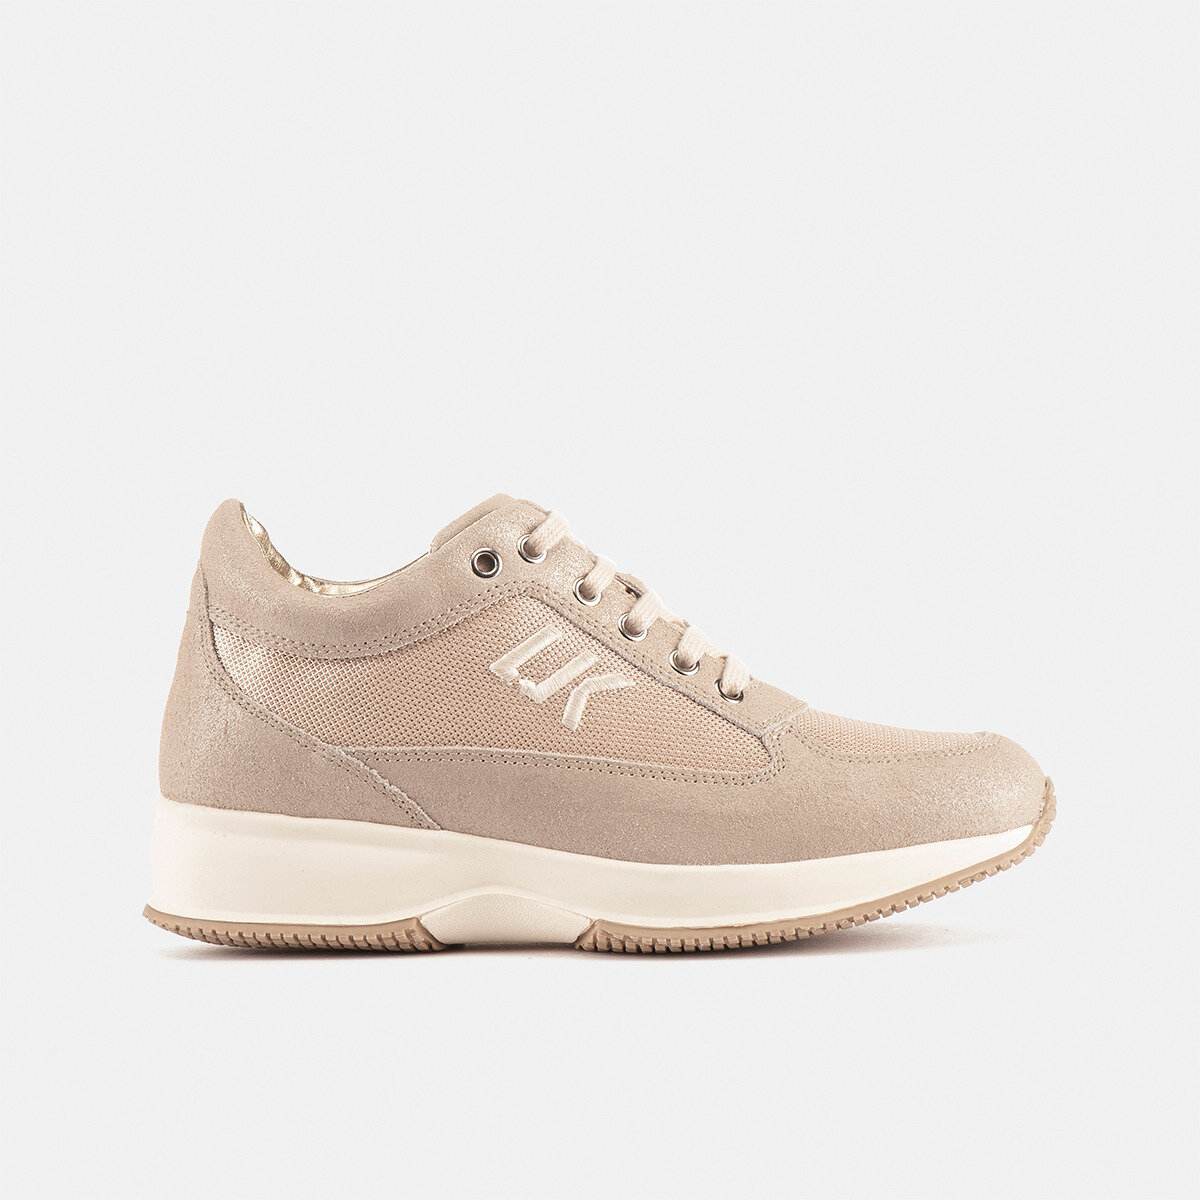 RAUL PLATINO Woman Sneakers